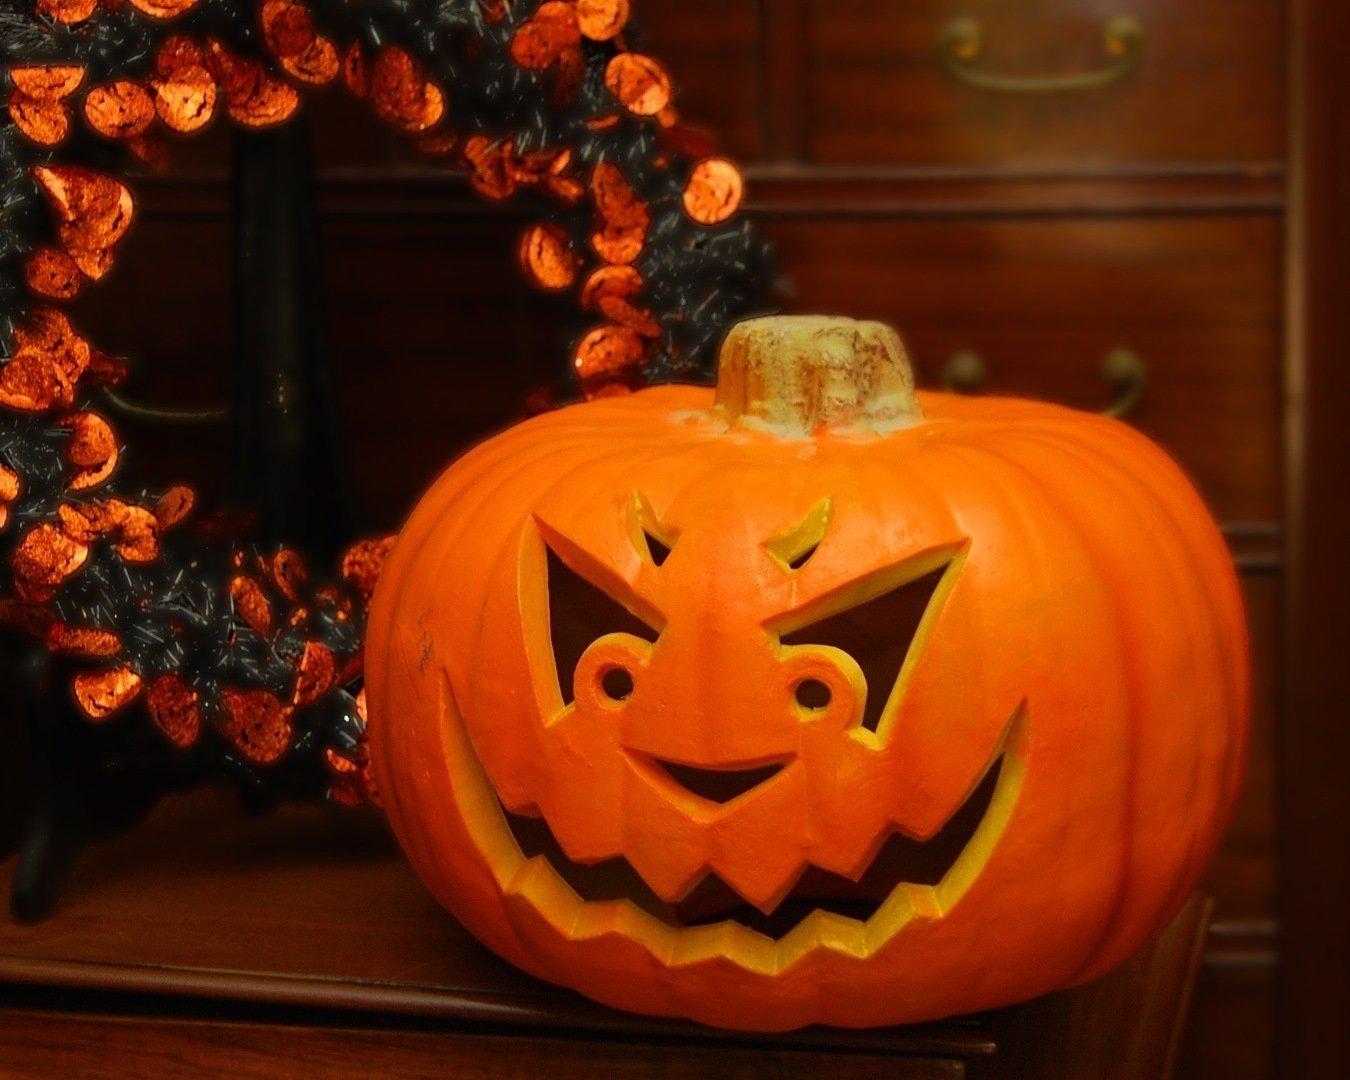 10 Famous Easy Pumpkin Carving Ideas Kids best 25 easy pumpkin carving patterns ideas on pinterest easy 2 2021